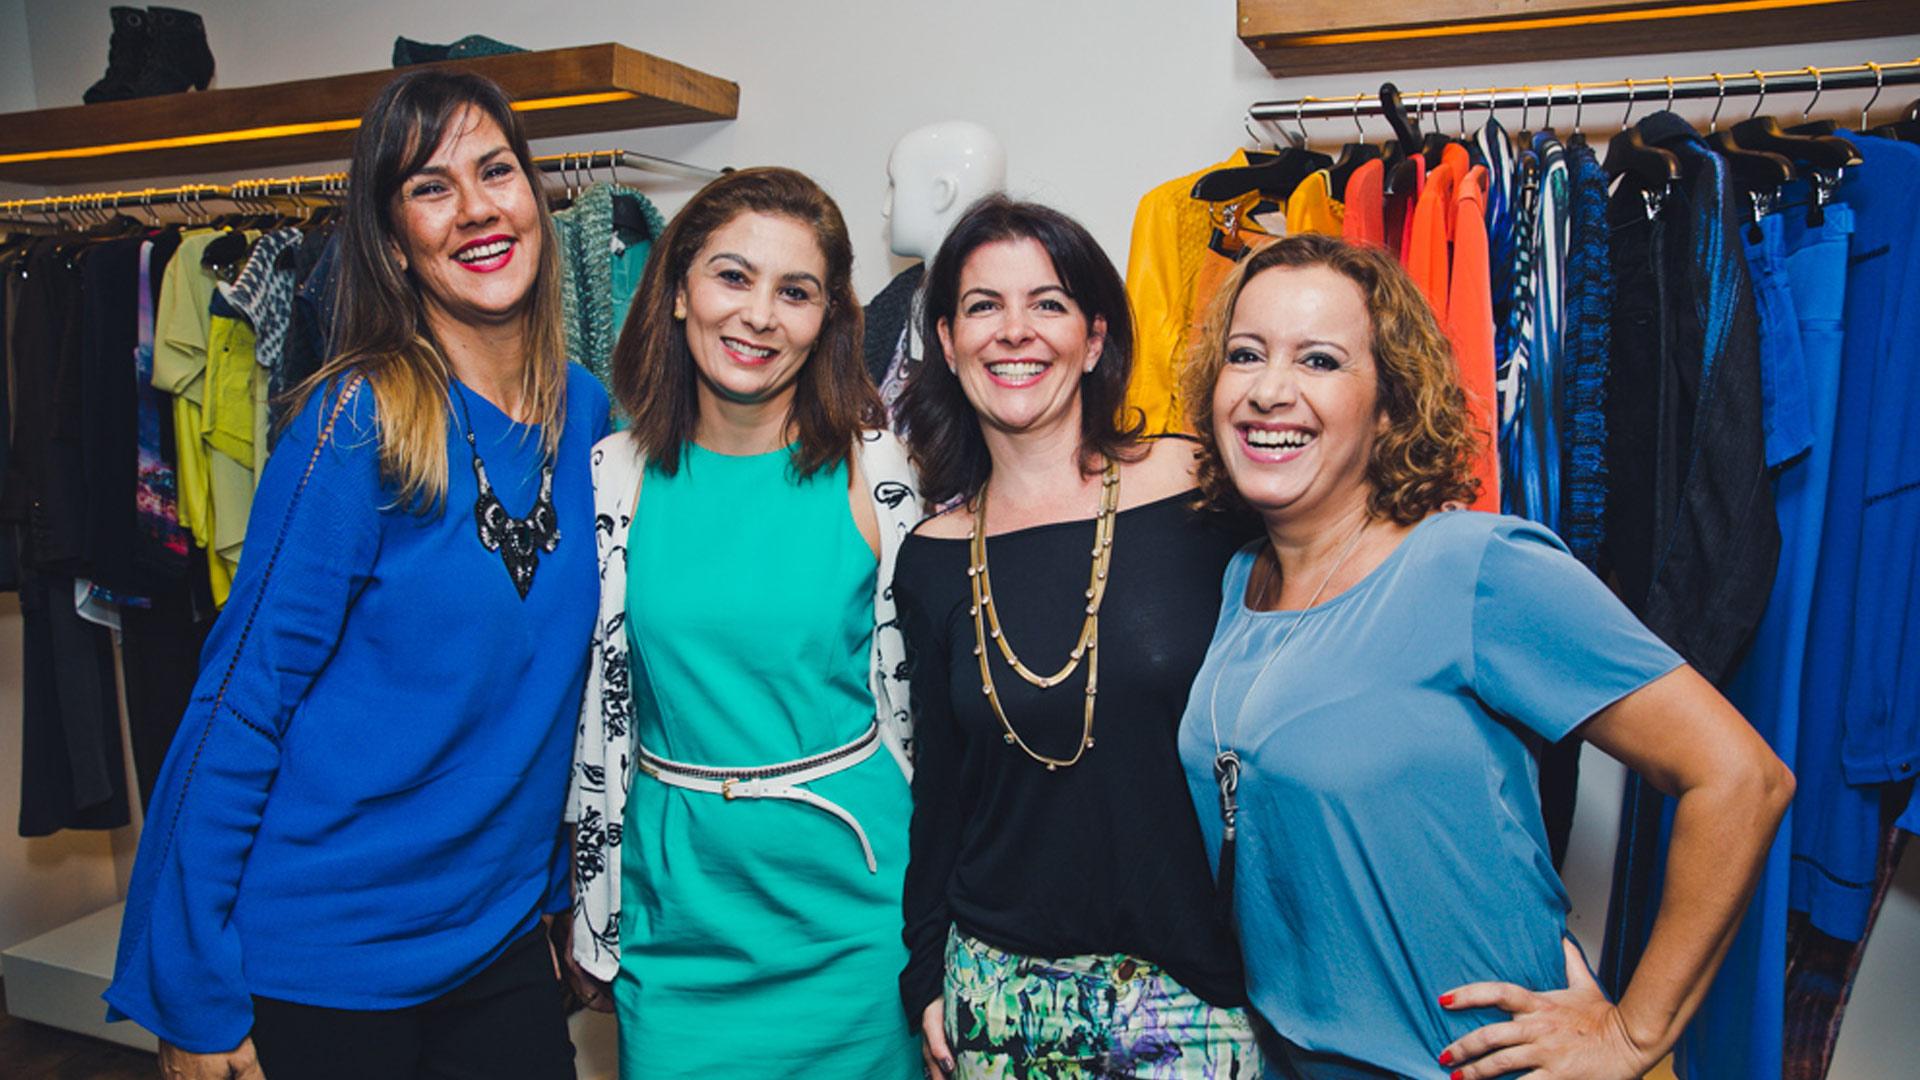 Suzana Arata, Melina Cunha, Laila Amin e Ana Leite